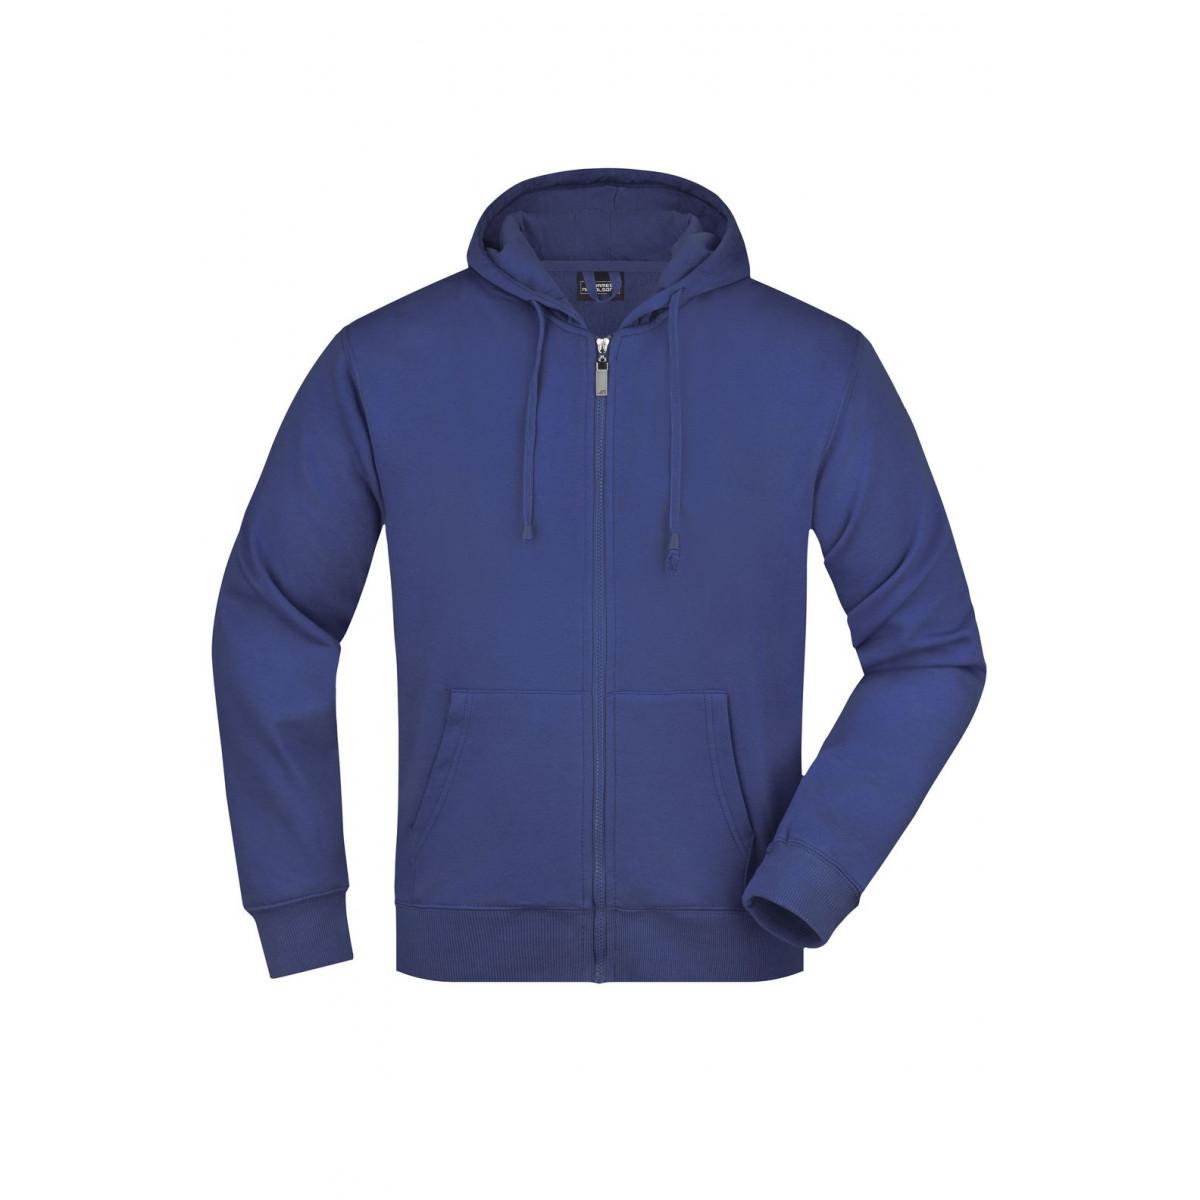 Толстовка мужская JN042 Mens Hooded Jacket - Ярко-синий